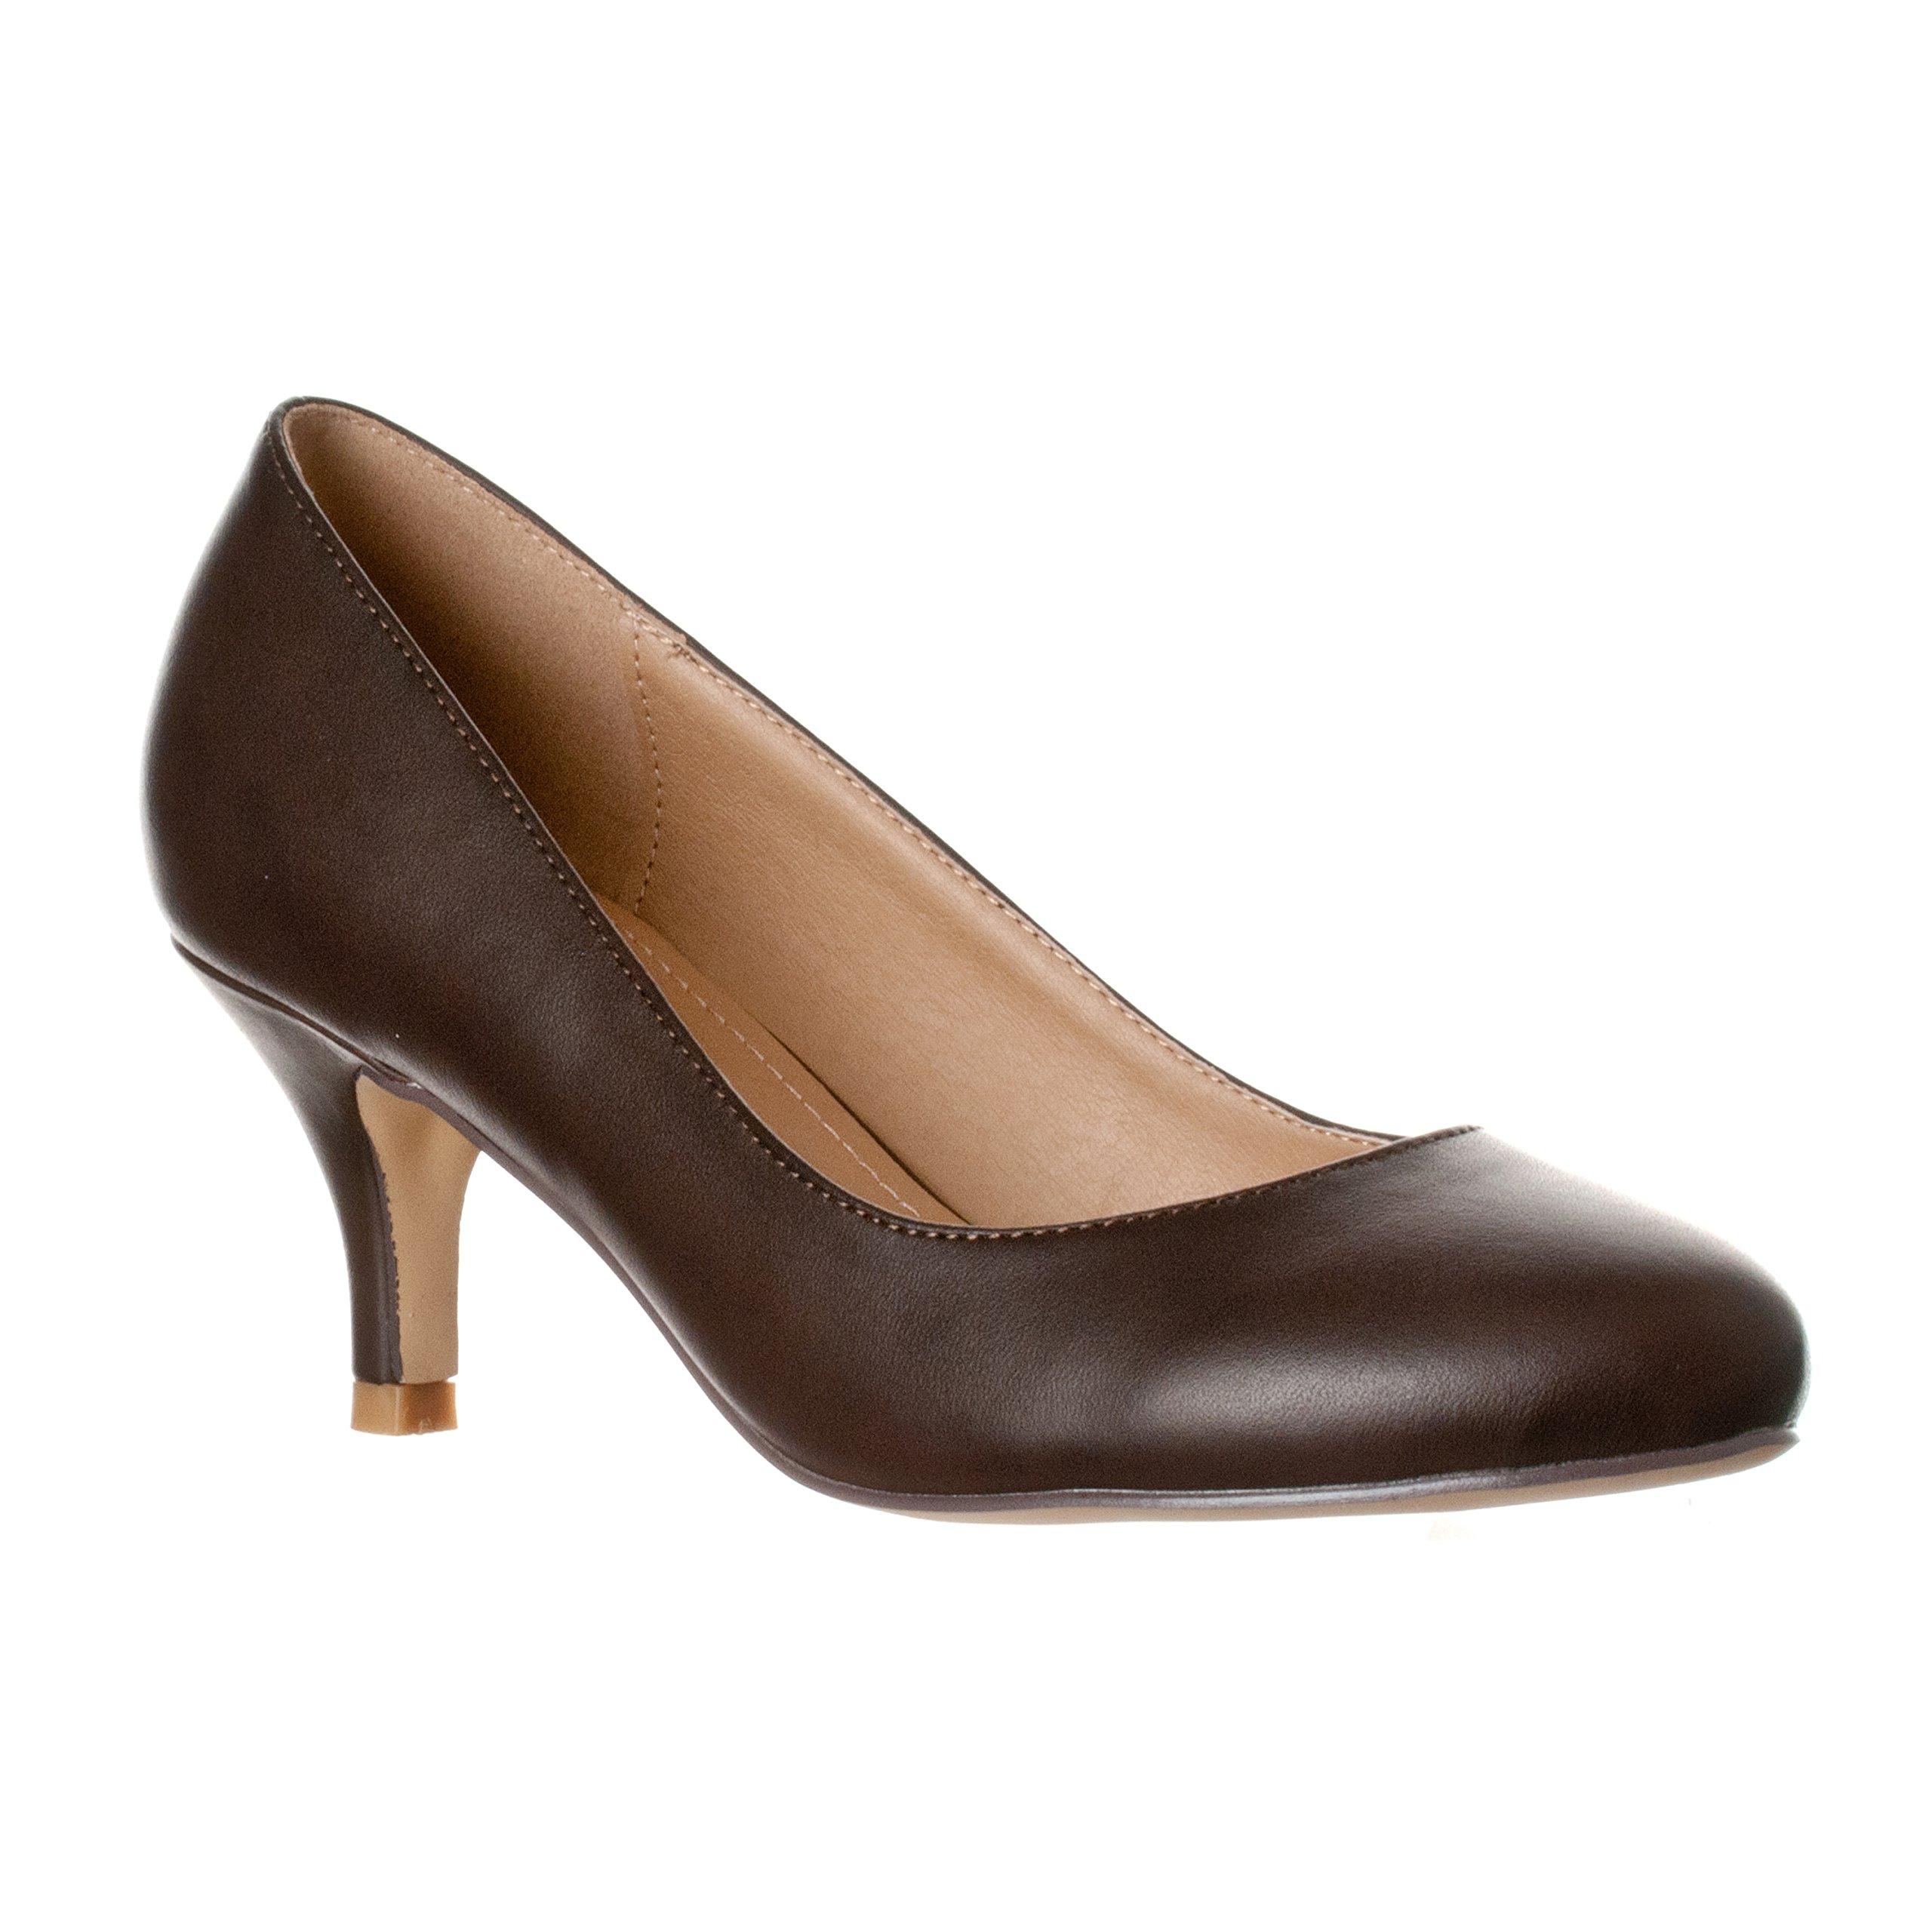 Riverberry Women's Ruby Round Toe, Kitten Low Height Pump Heels, Coffee PU, 8.5